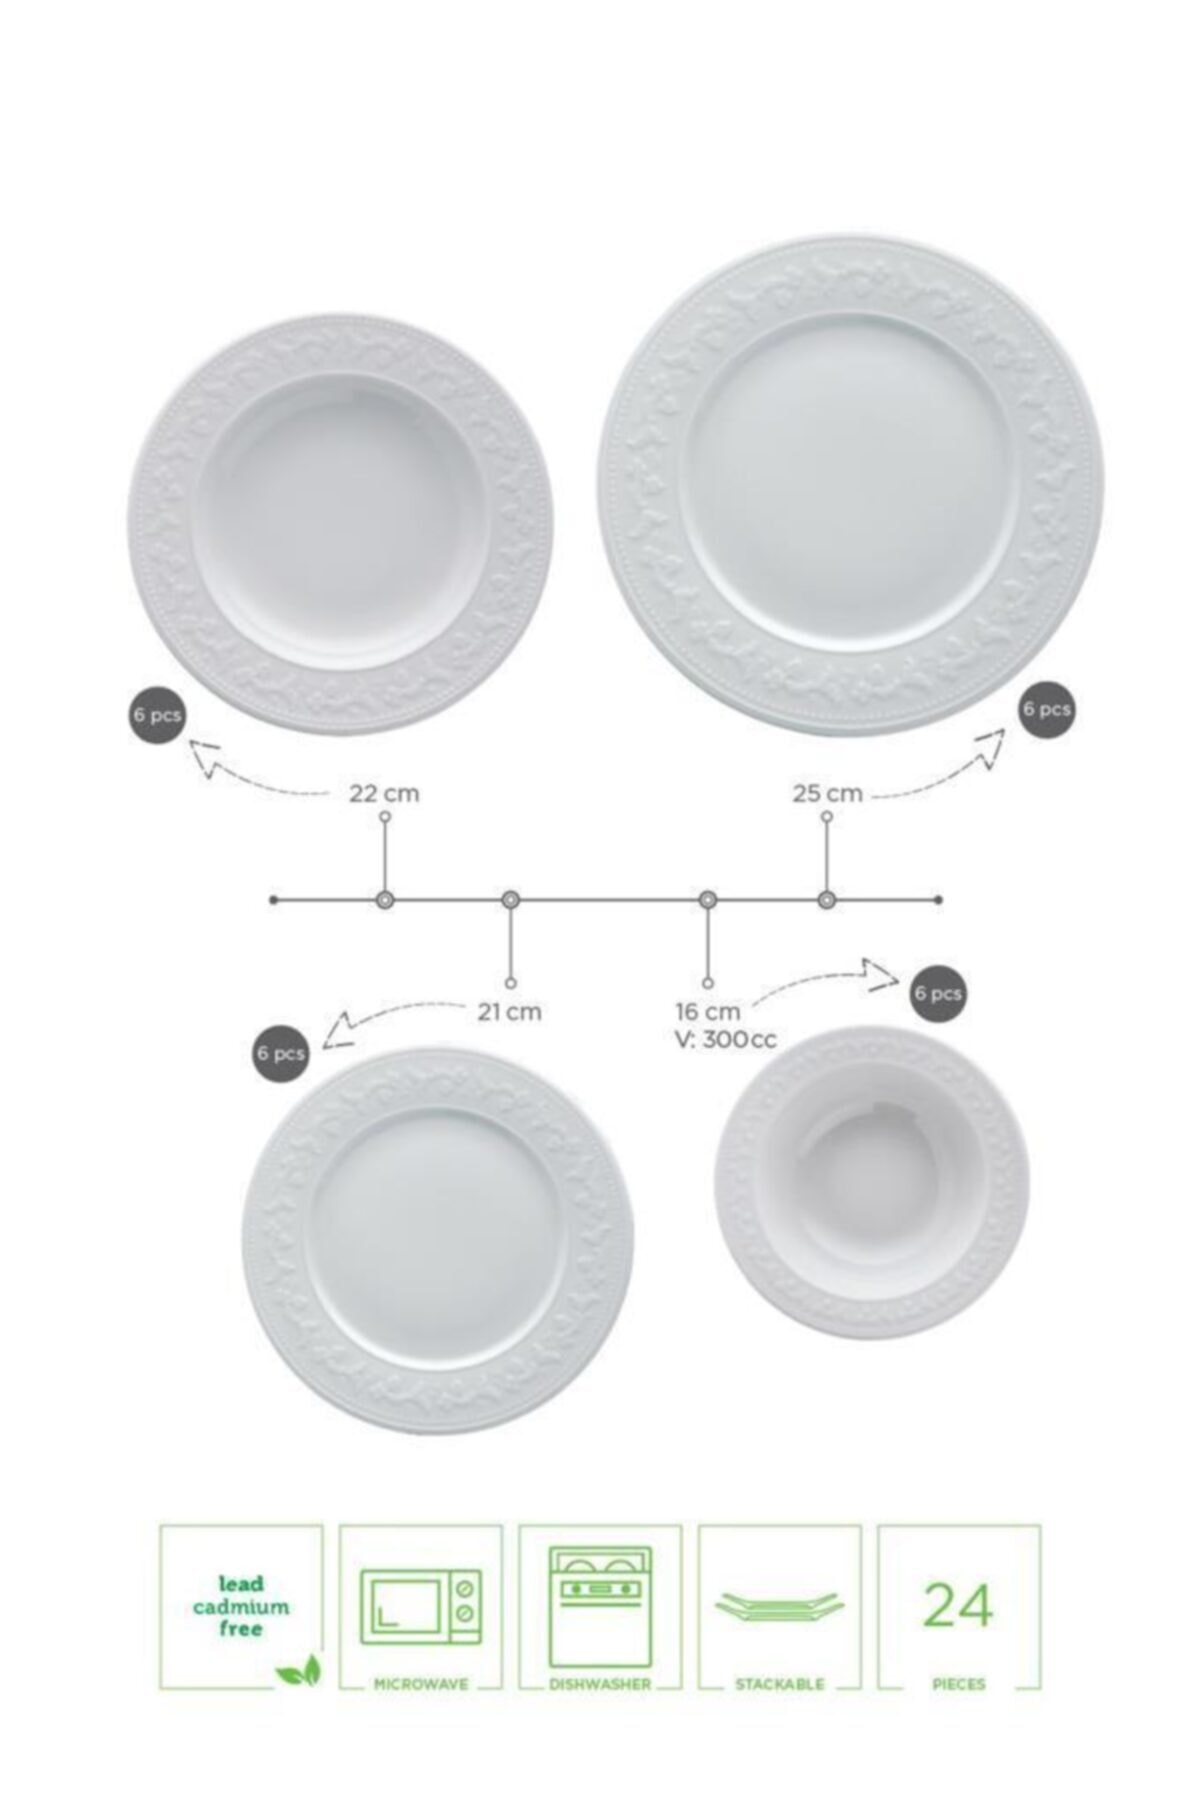 Luxury new model new dinnerware set dish set Silvia Dinnerware Set 24 Piece dinnerware enlarge